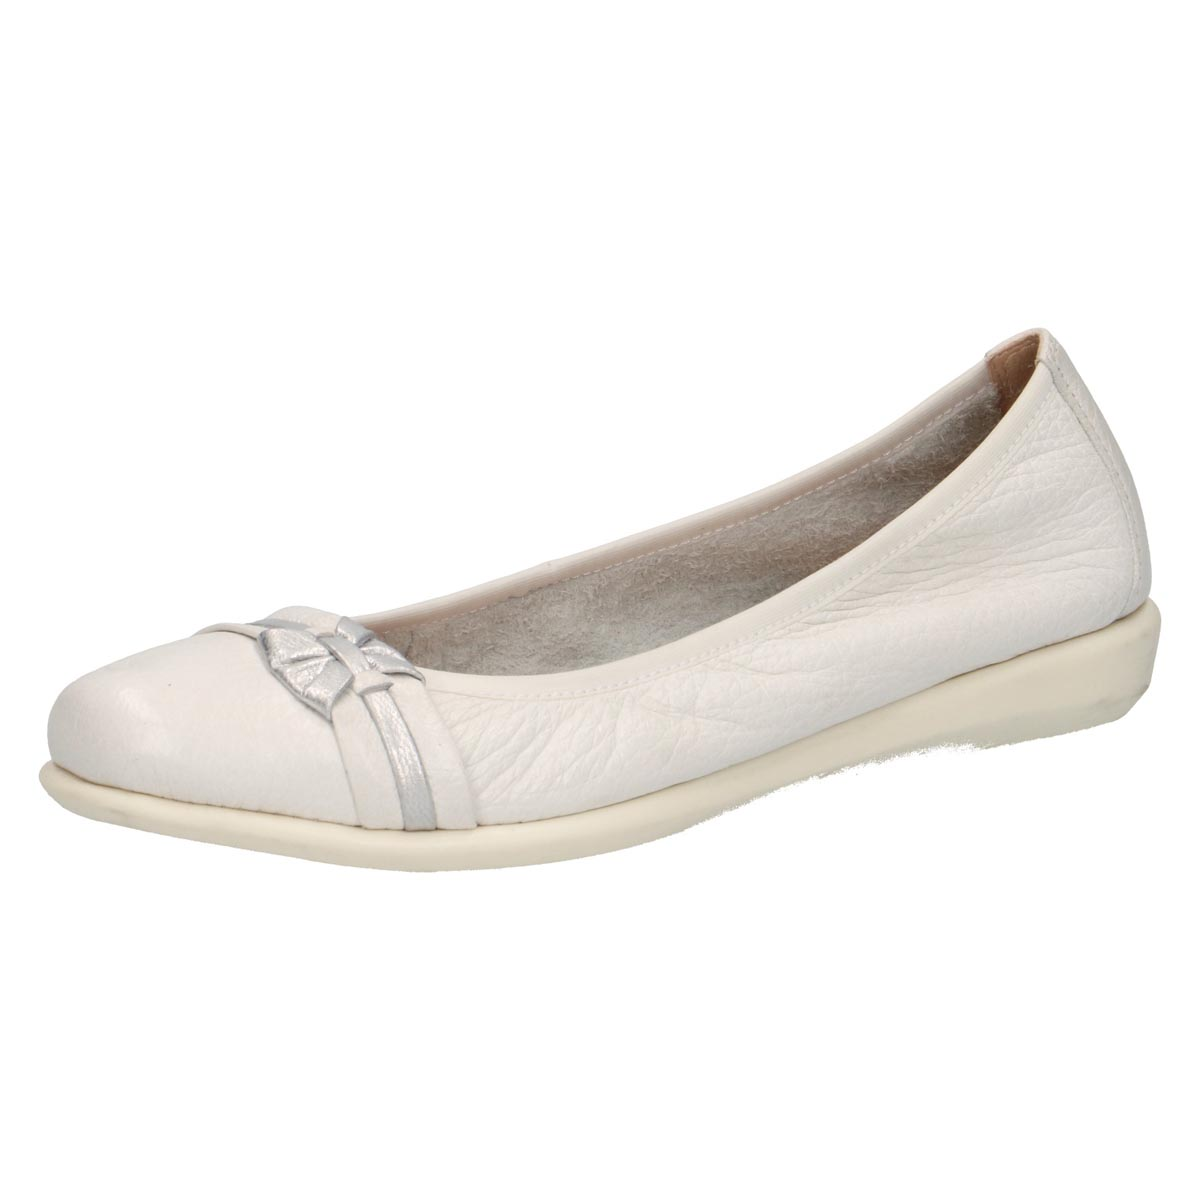 Carole - Caprice Soft White Ballerina